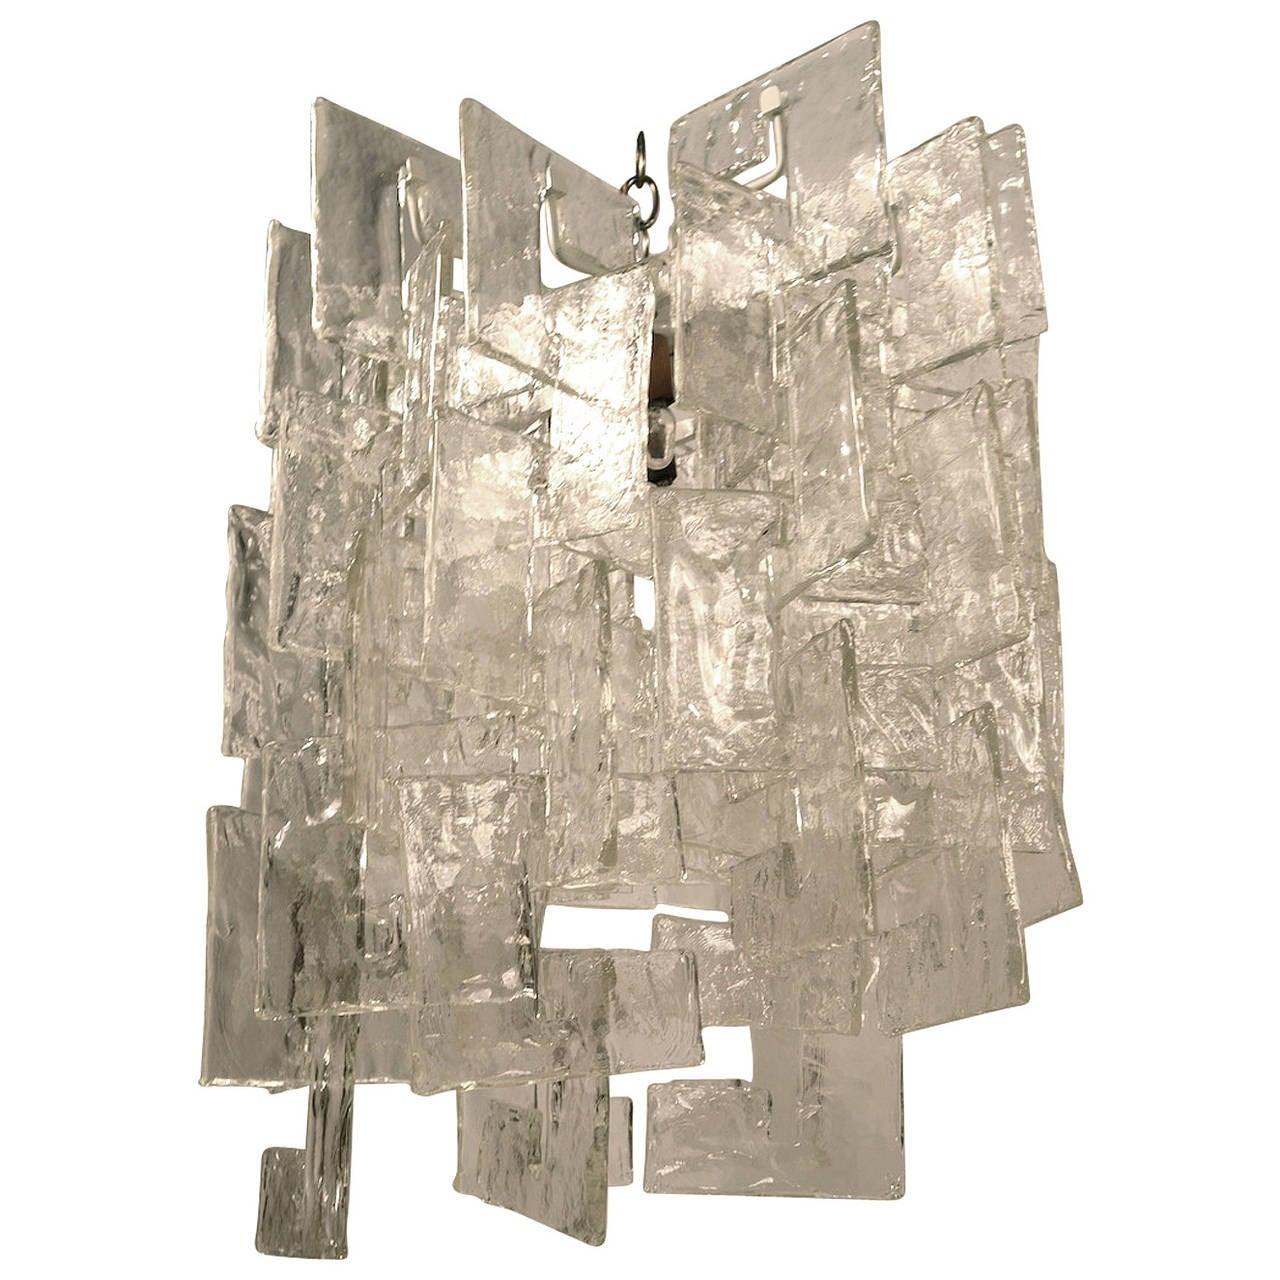 Mazzega Murano interlocking glass chandelier, 1970s, offered by Barbarella Home